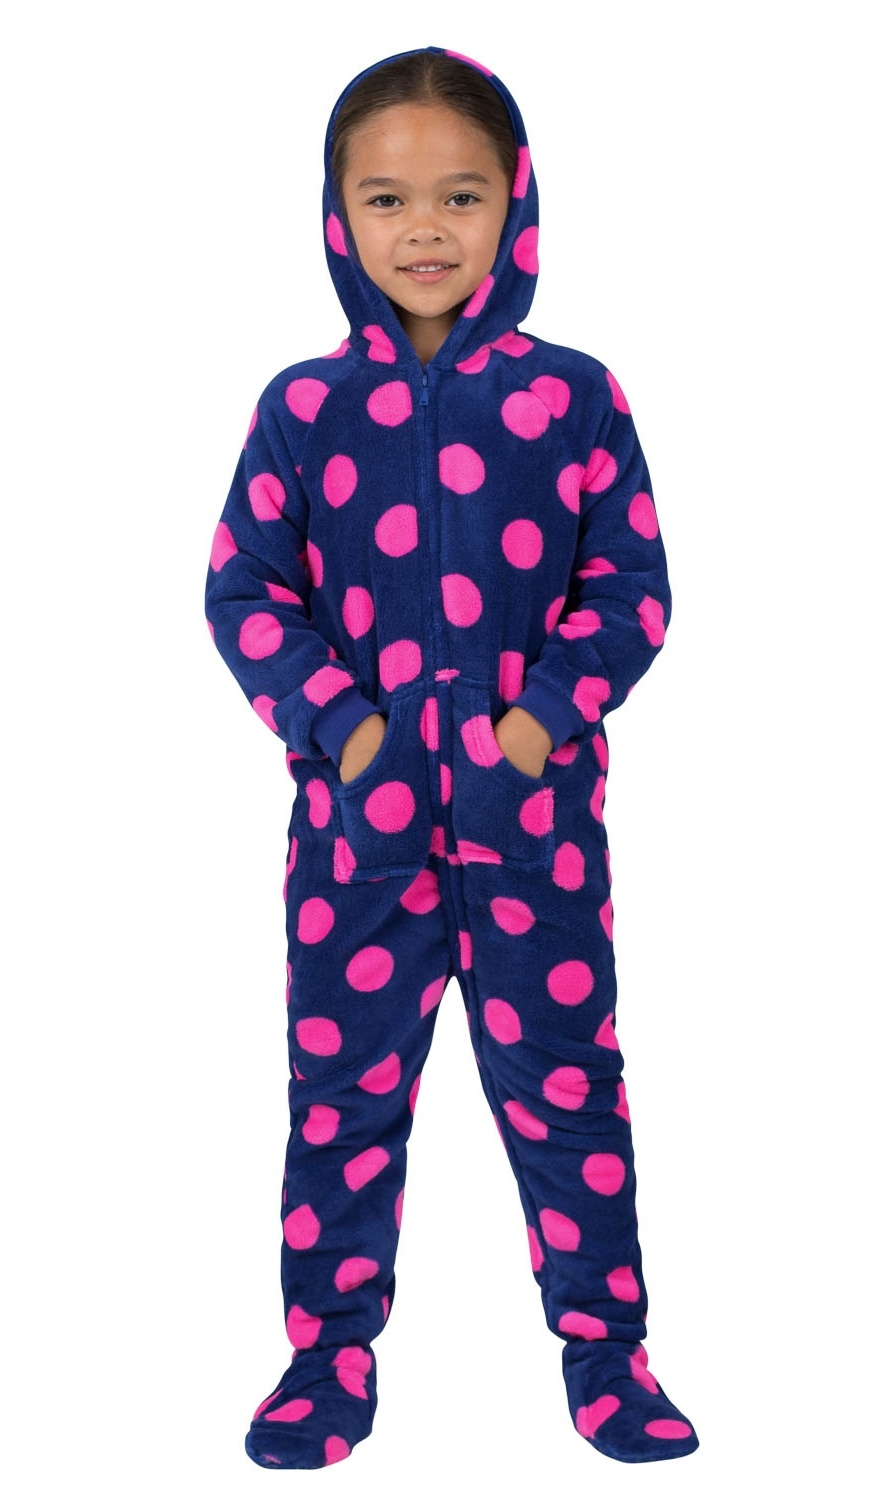 Footed Pajamas - Footed Pajamas - Navy Pink Polka Toddler Hoodie Chenille  Onesie - Walmart.com 64dcb4153